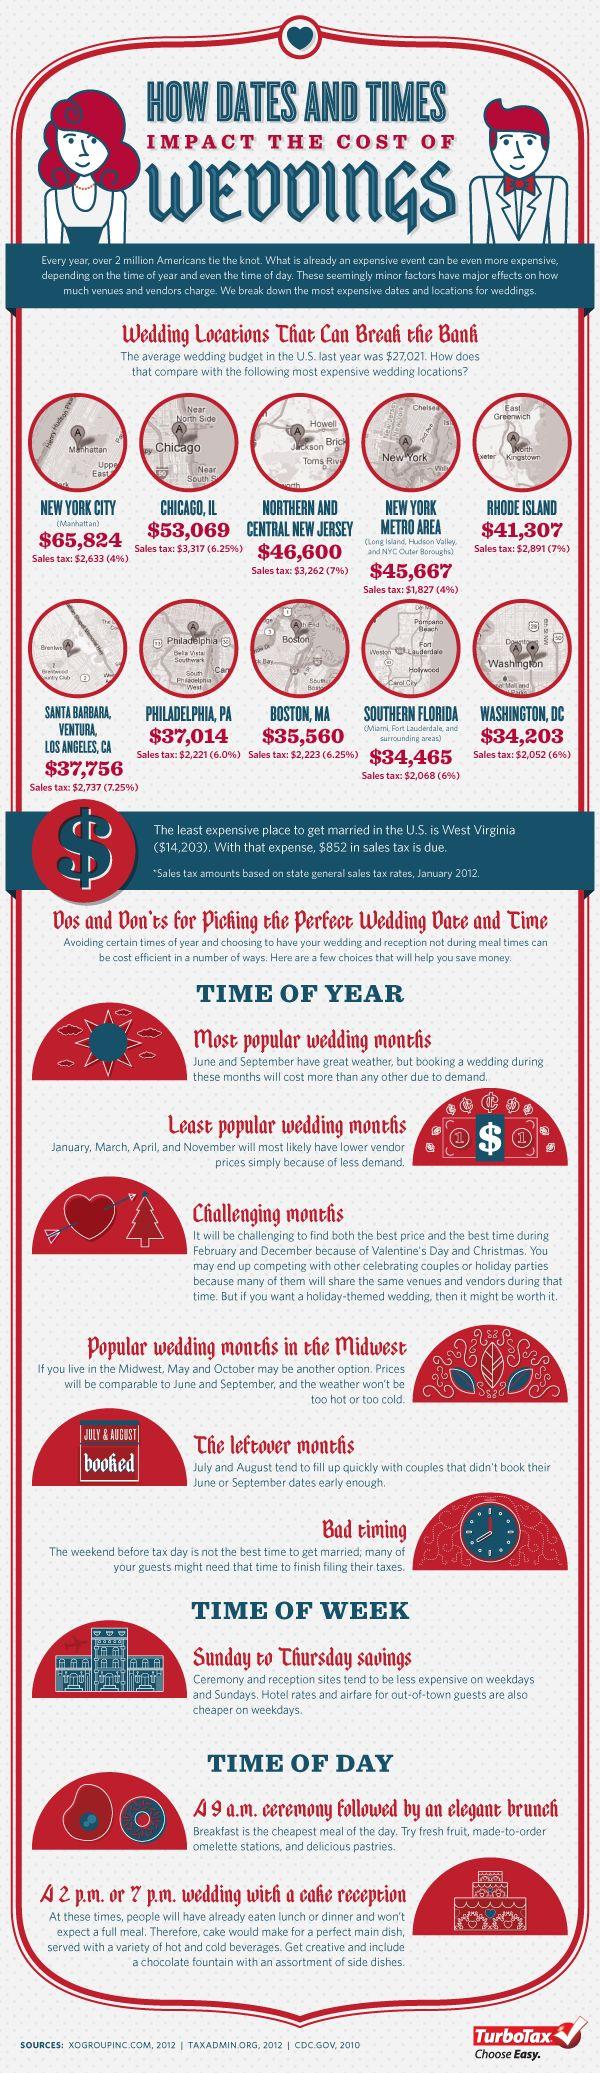 Wedding planning.